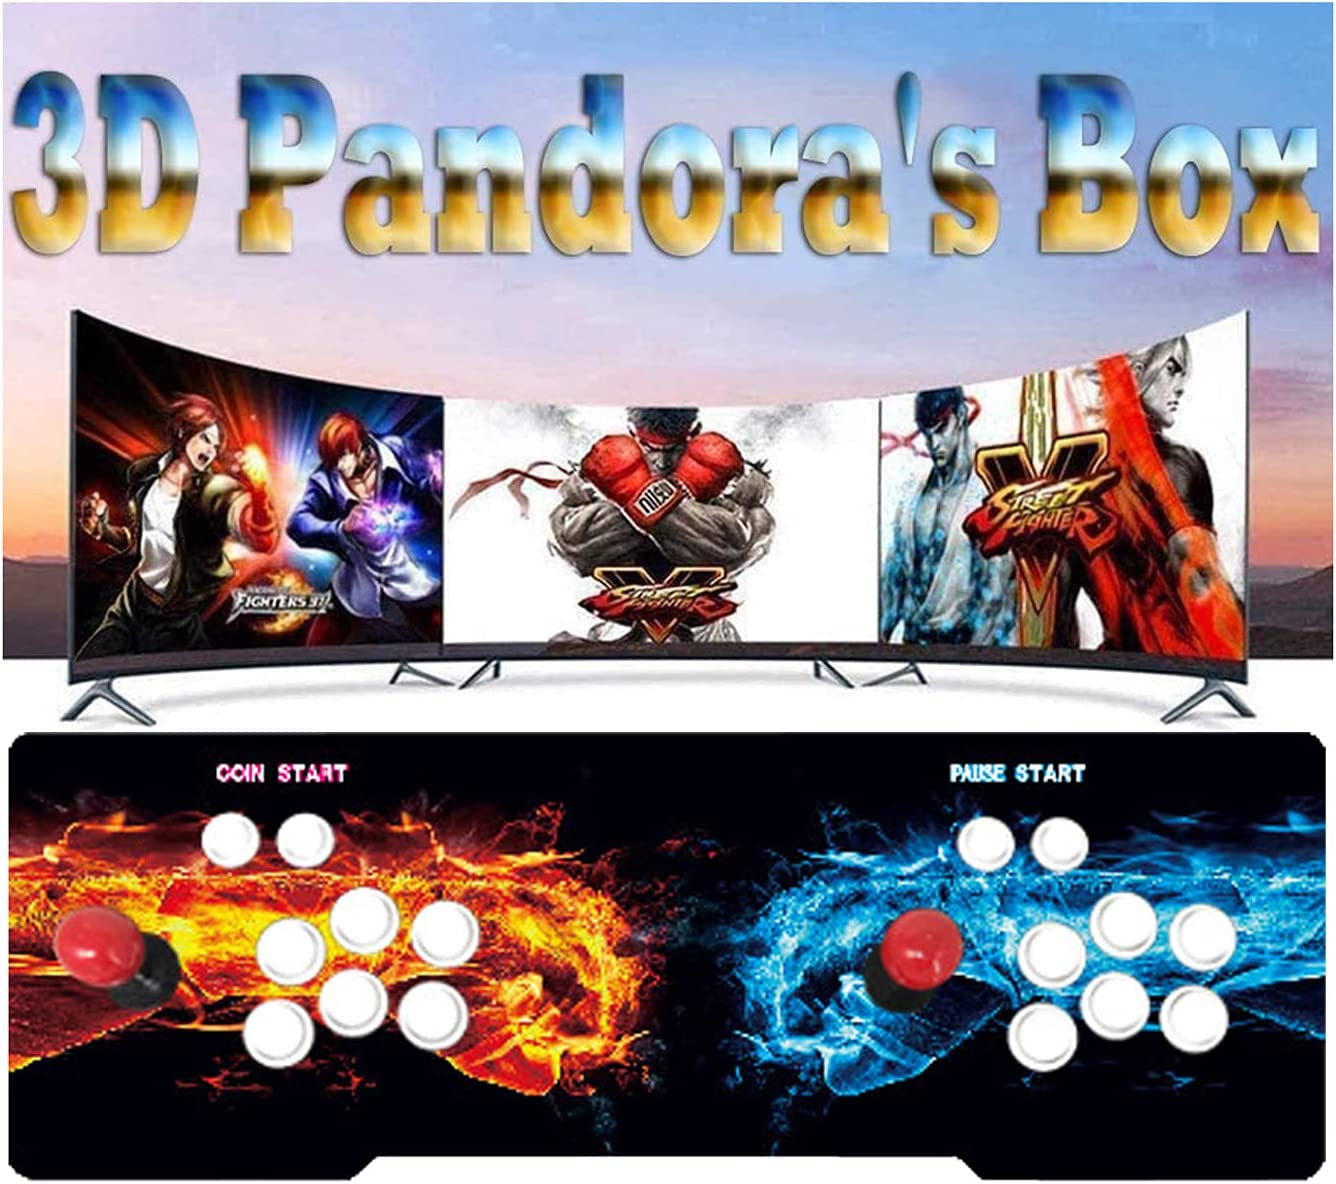 TANCEQI Pandora gift Box X Retro Video Game Console Arcade Games Award 3303